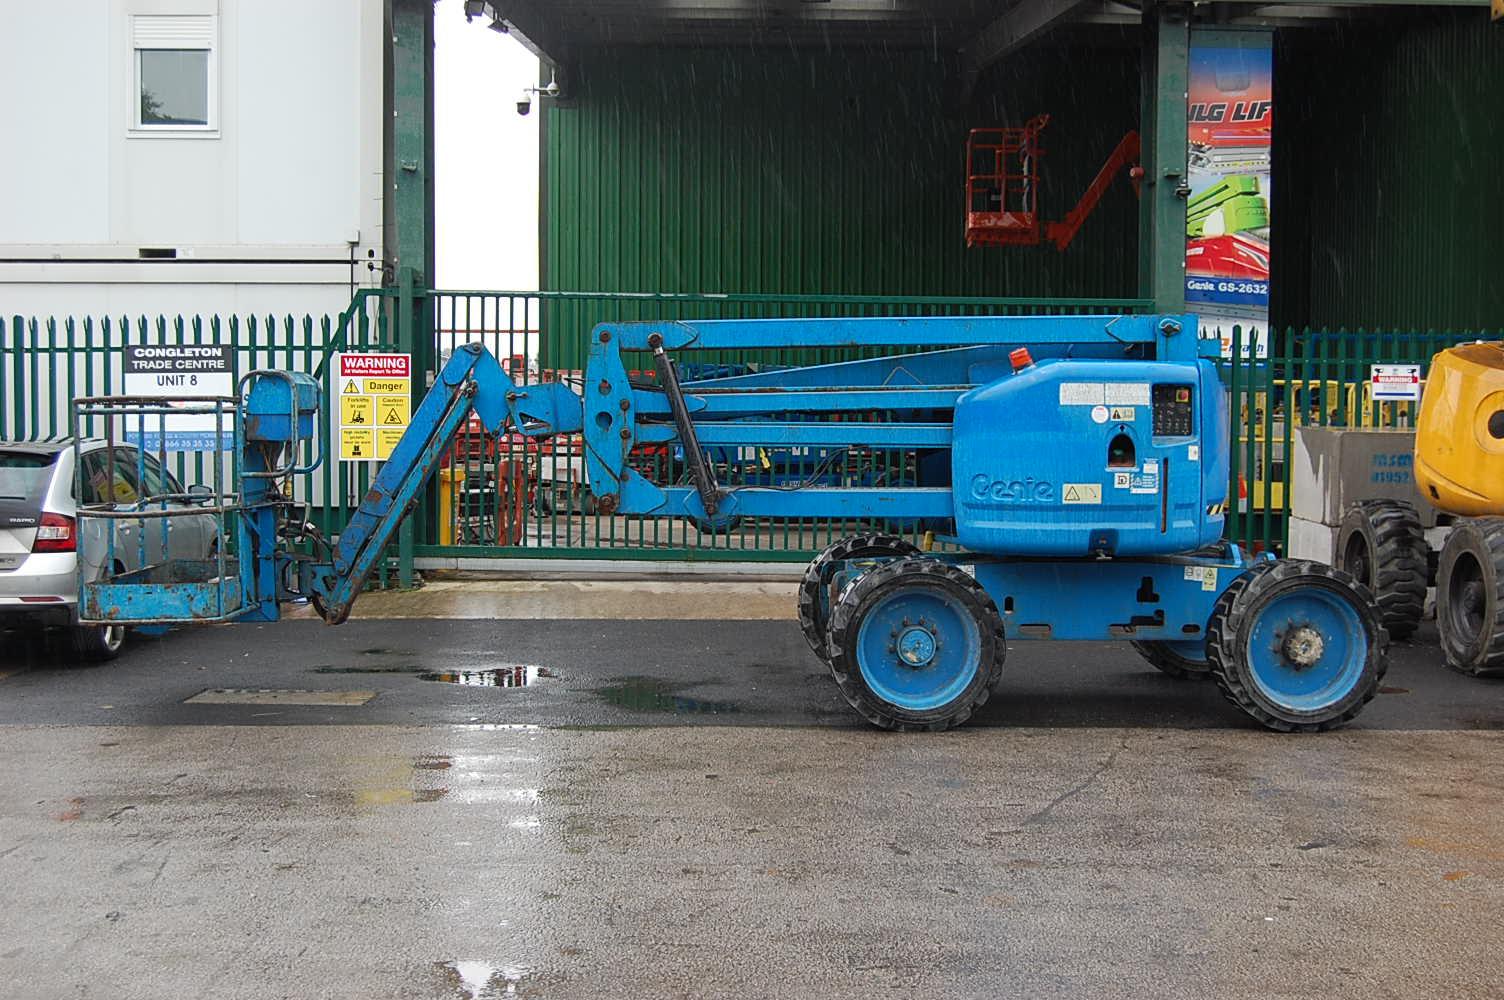 Genie Z45/25J Rough Terrain Diesel 16m Boom Lift